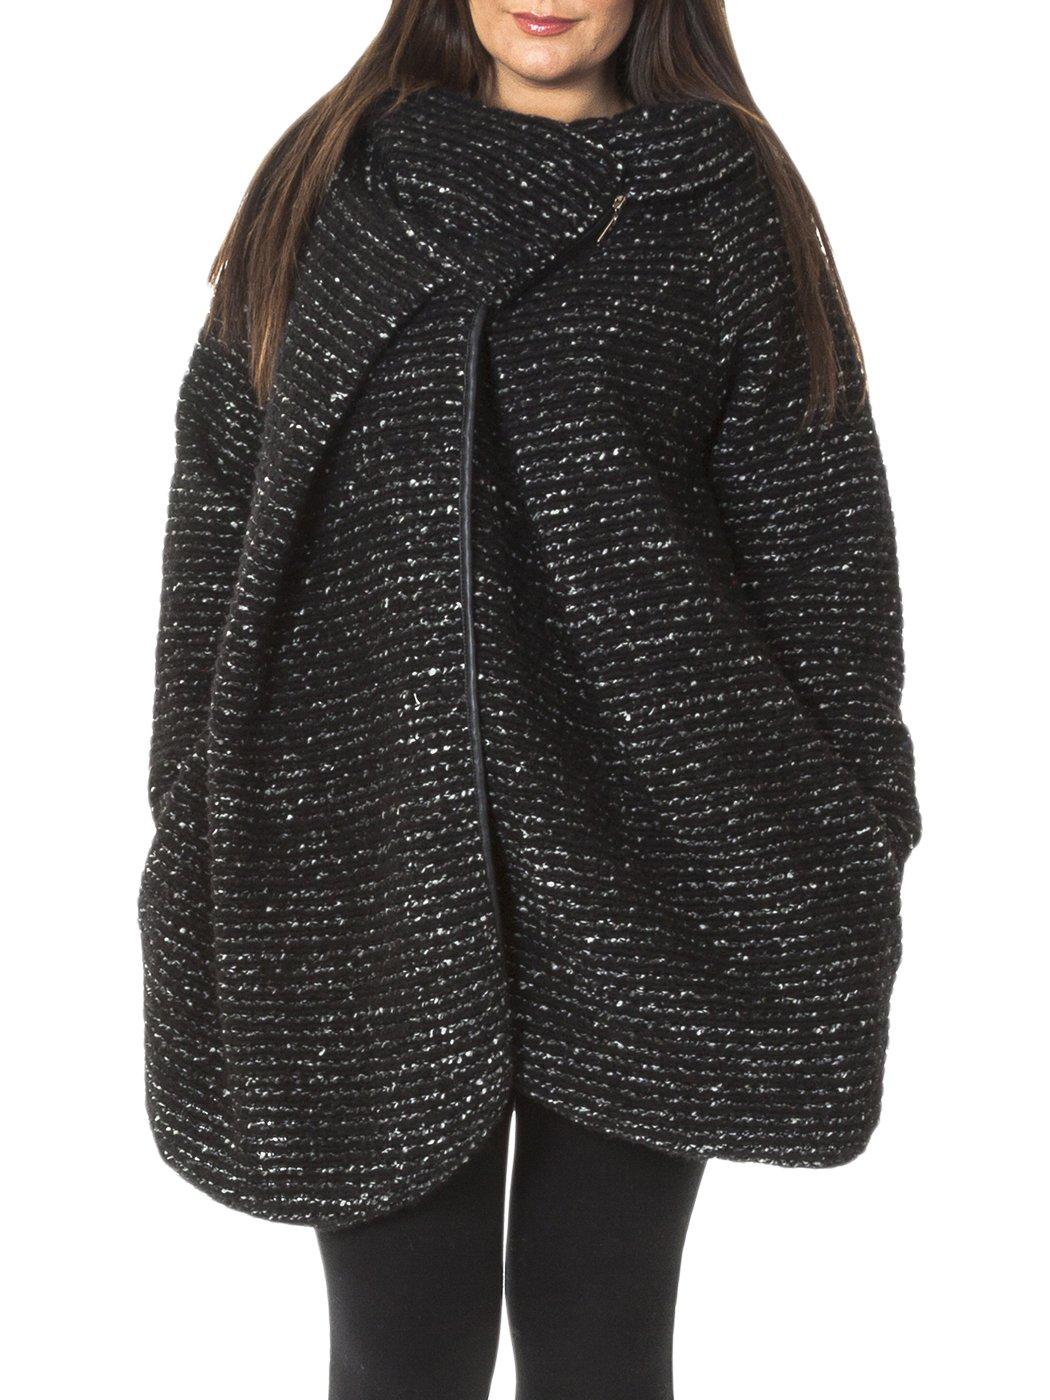 Citaten Winter Xl : Womens italian cocoon wool knitted quirky lagenlook coat